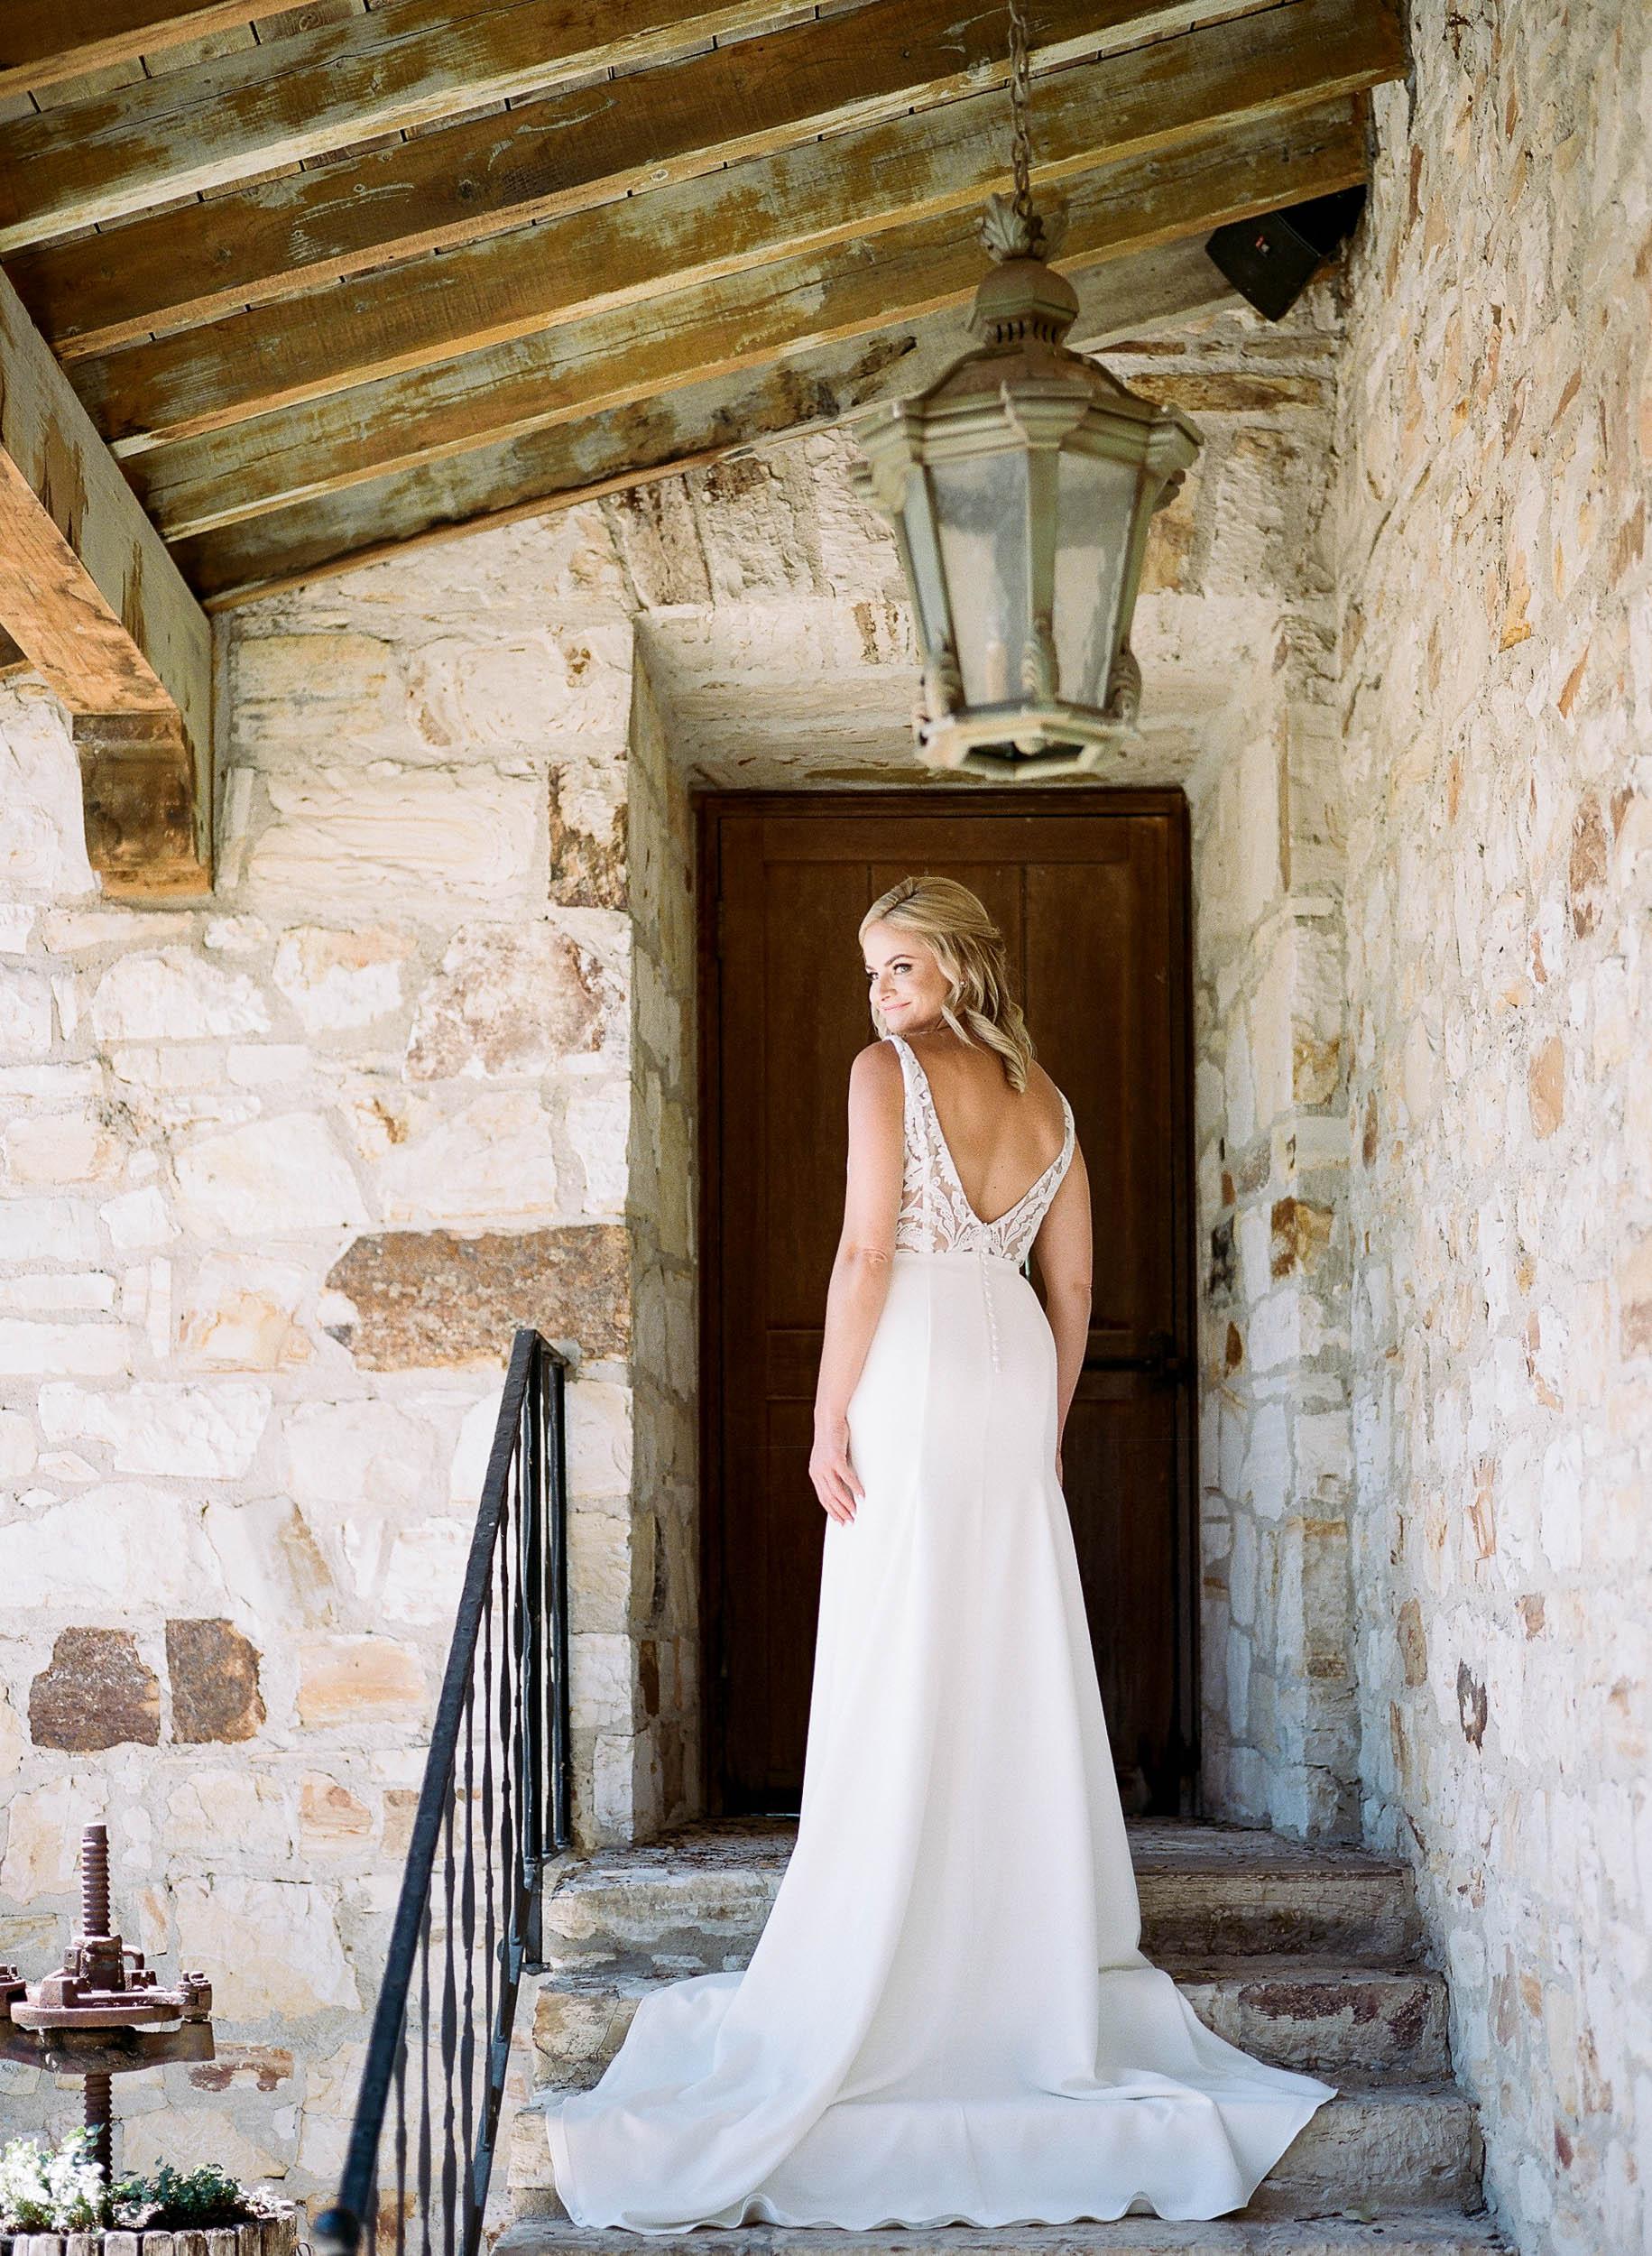 072118_D+K_Holman Ranch Wedding_Buena Lane Photography_00005427_96.jpg